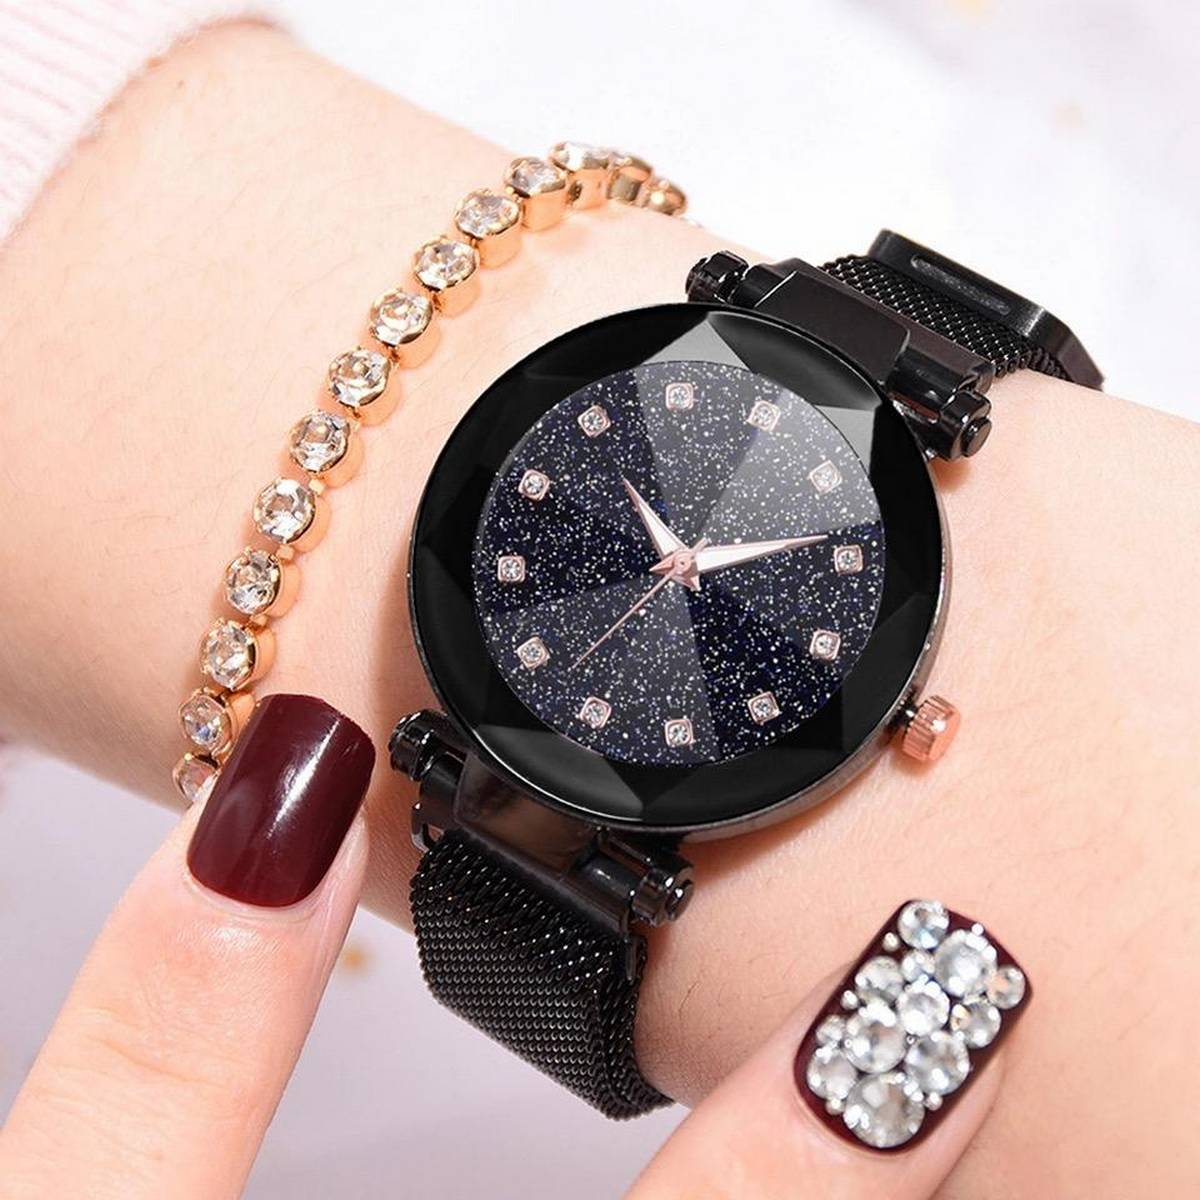 Women Mesh Magnet Buckle Starry Sky Luxury Fashion Quartz Watch/Wristwatch - 2021 Model - Magnetic Strip -  College/Office Girls